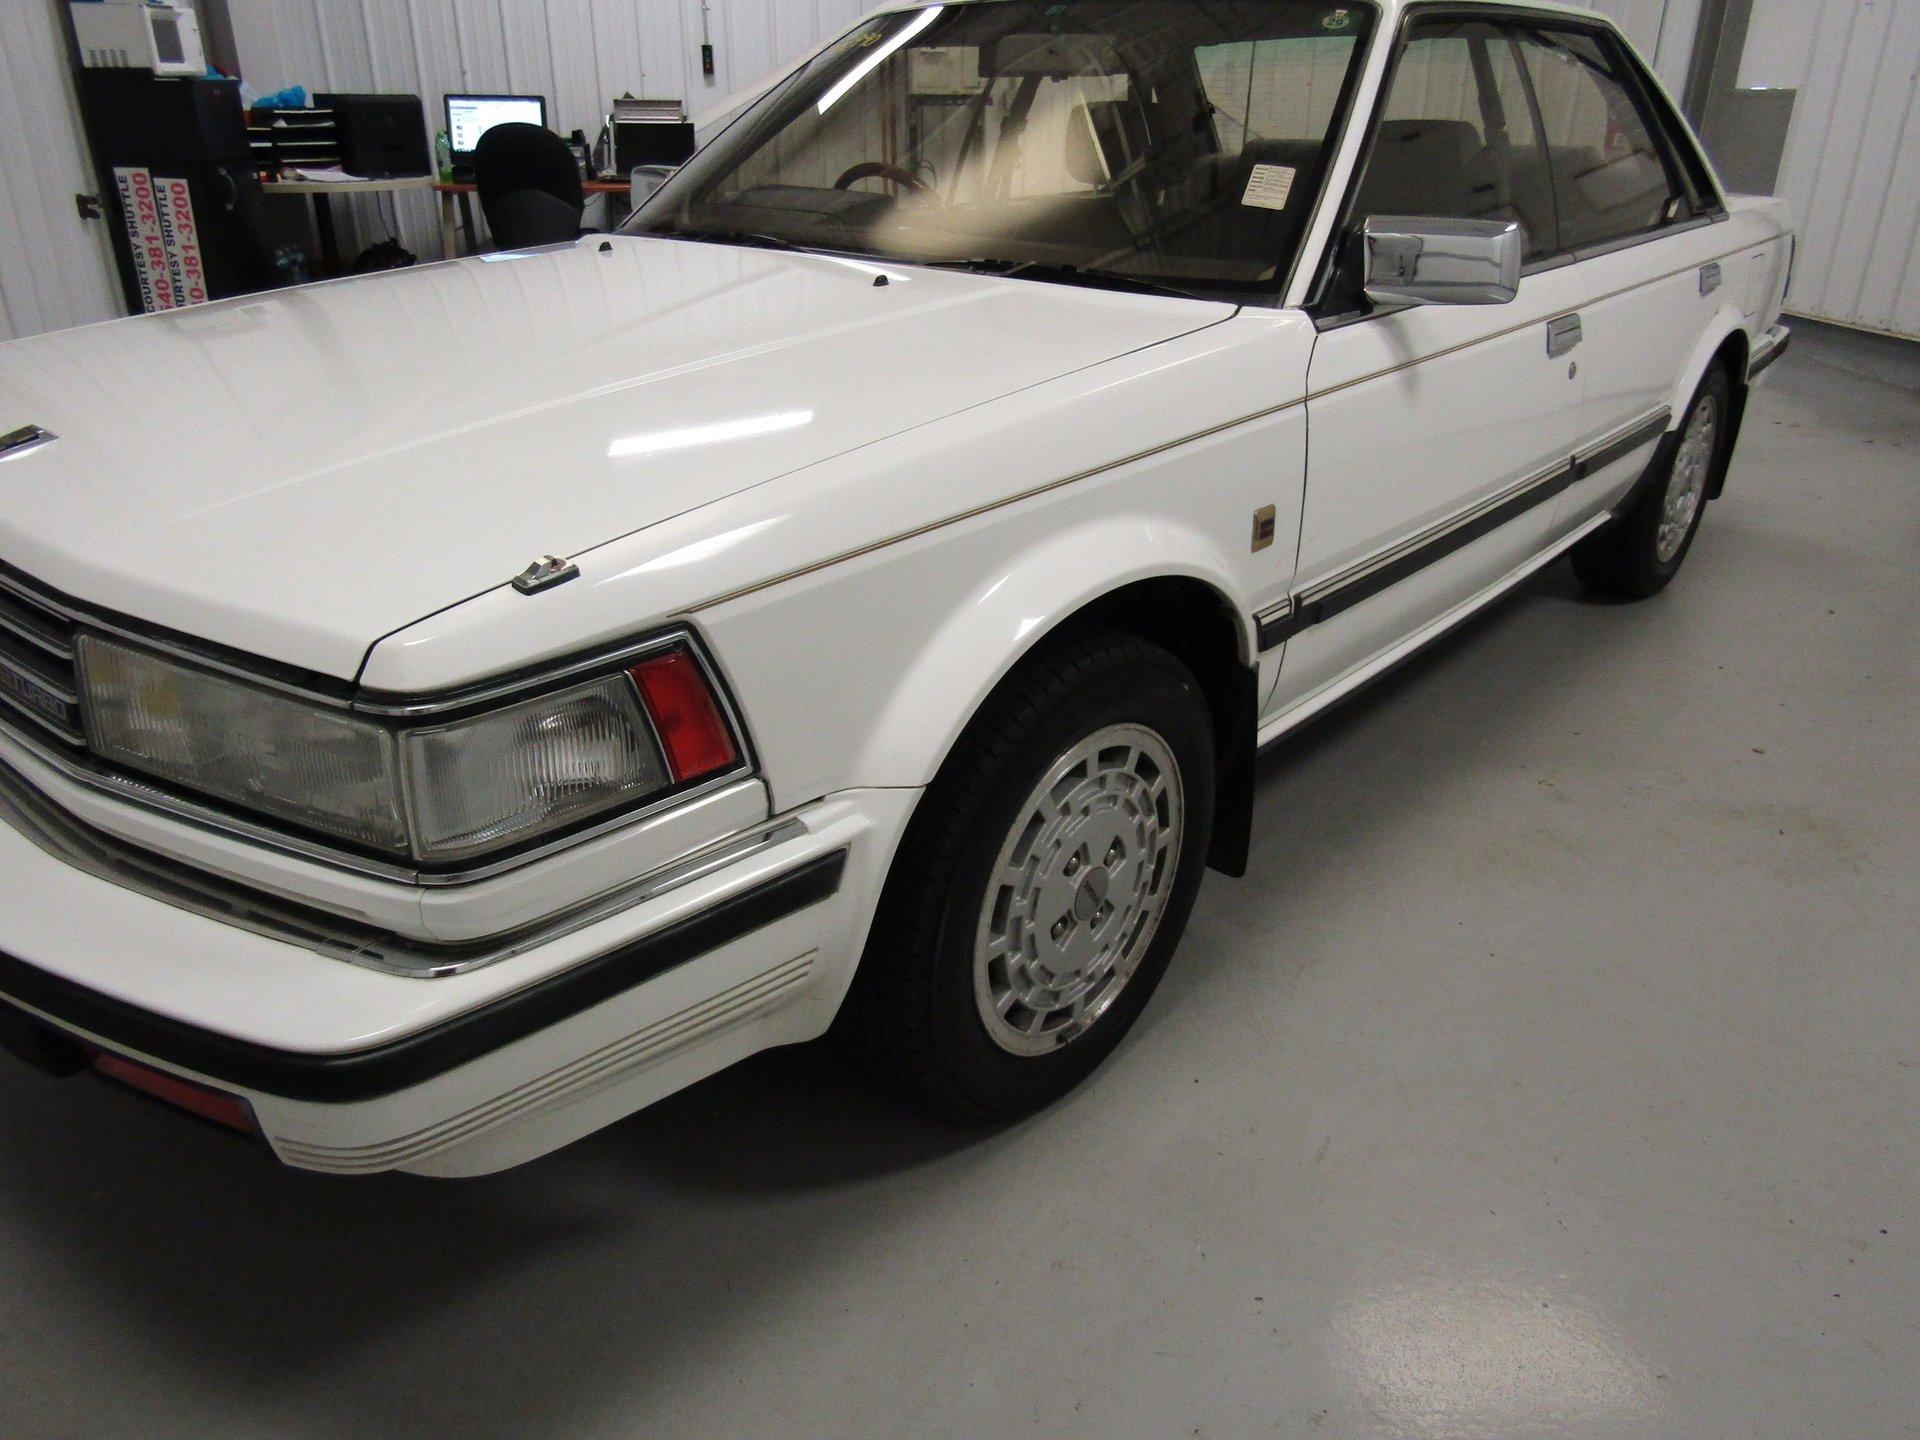 1985 Nissan Bluebird Maxima